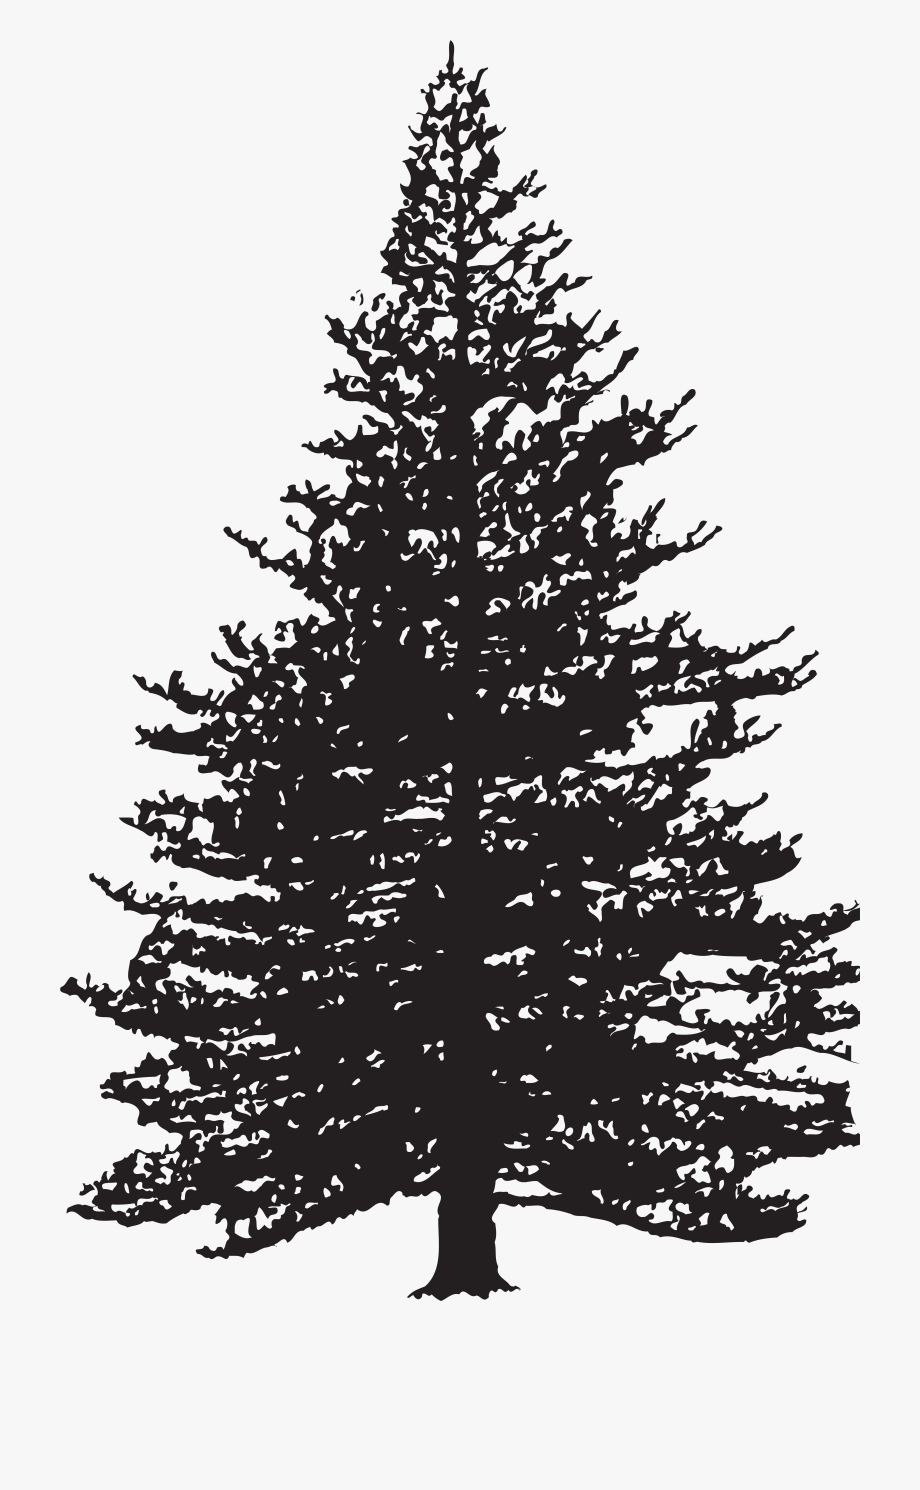 Pine silhouette clipart black and white clip art library download Pine Tree Silhouette Clip Art Image - Pine Tree Clip Art ... clip art library download